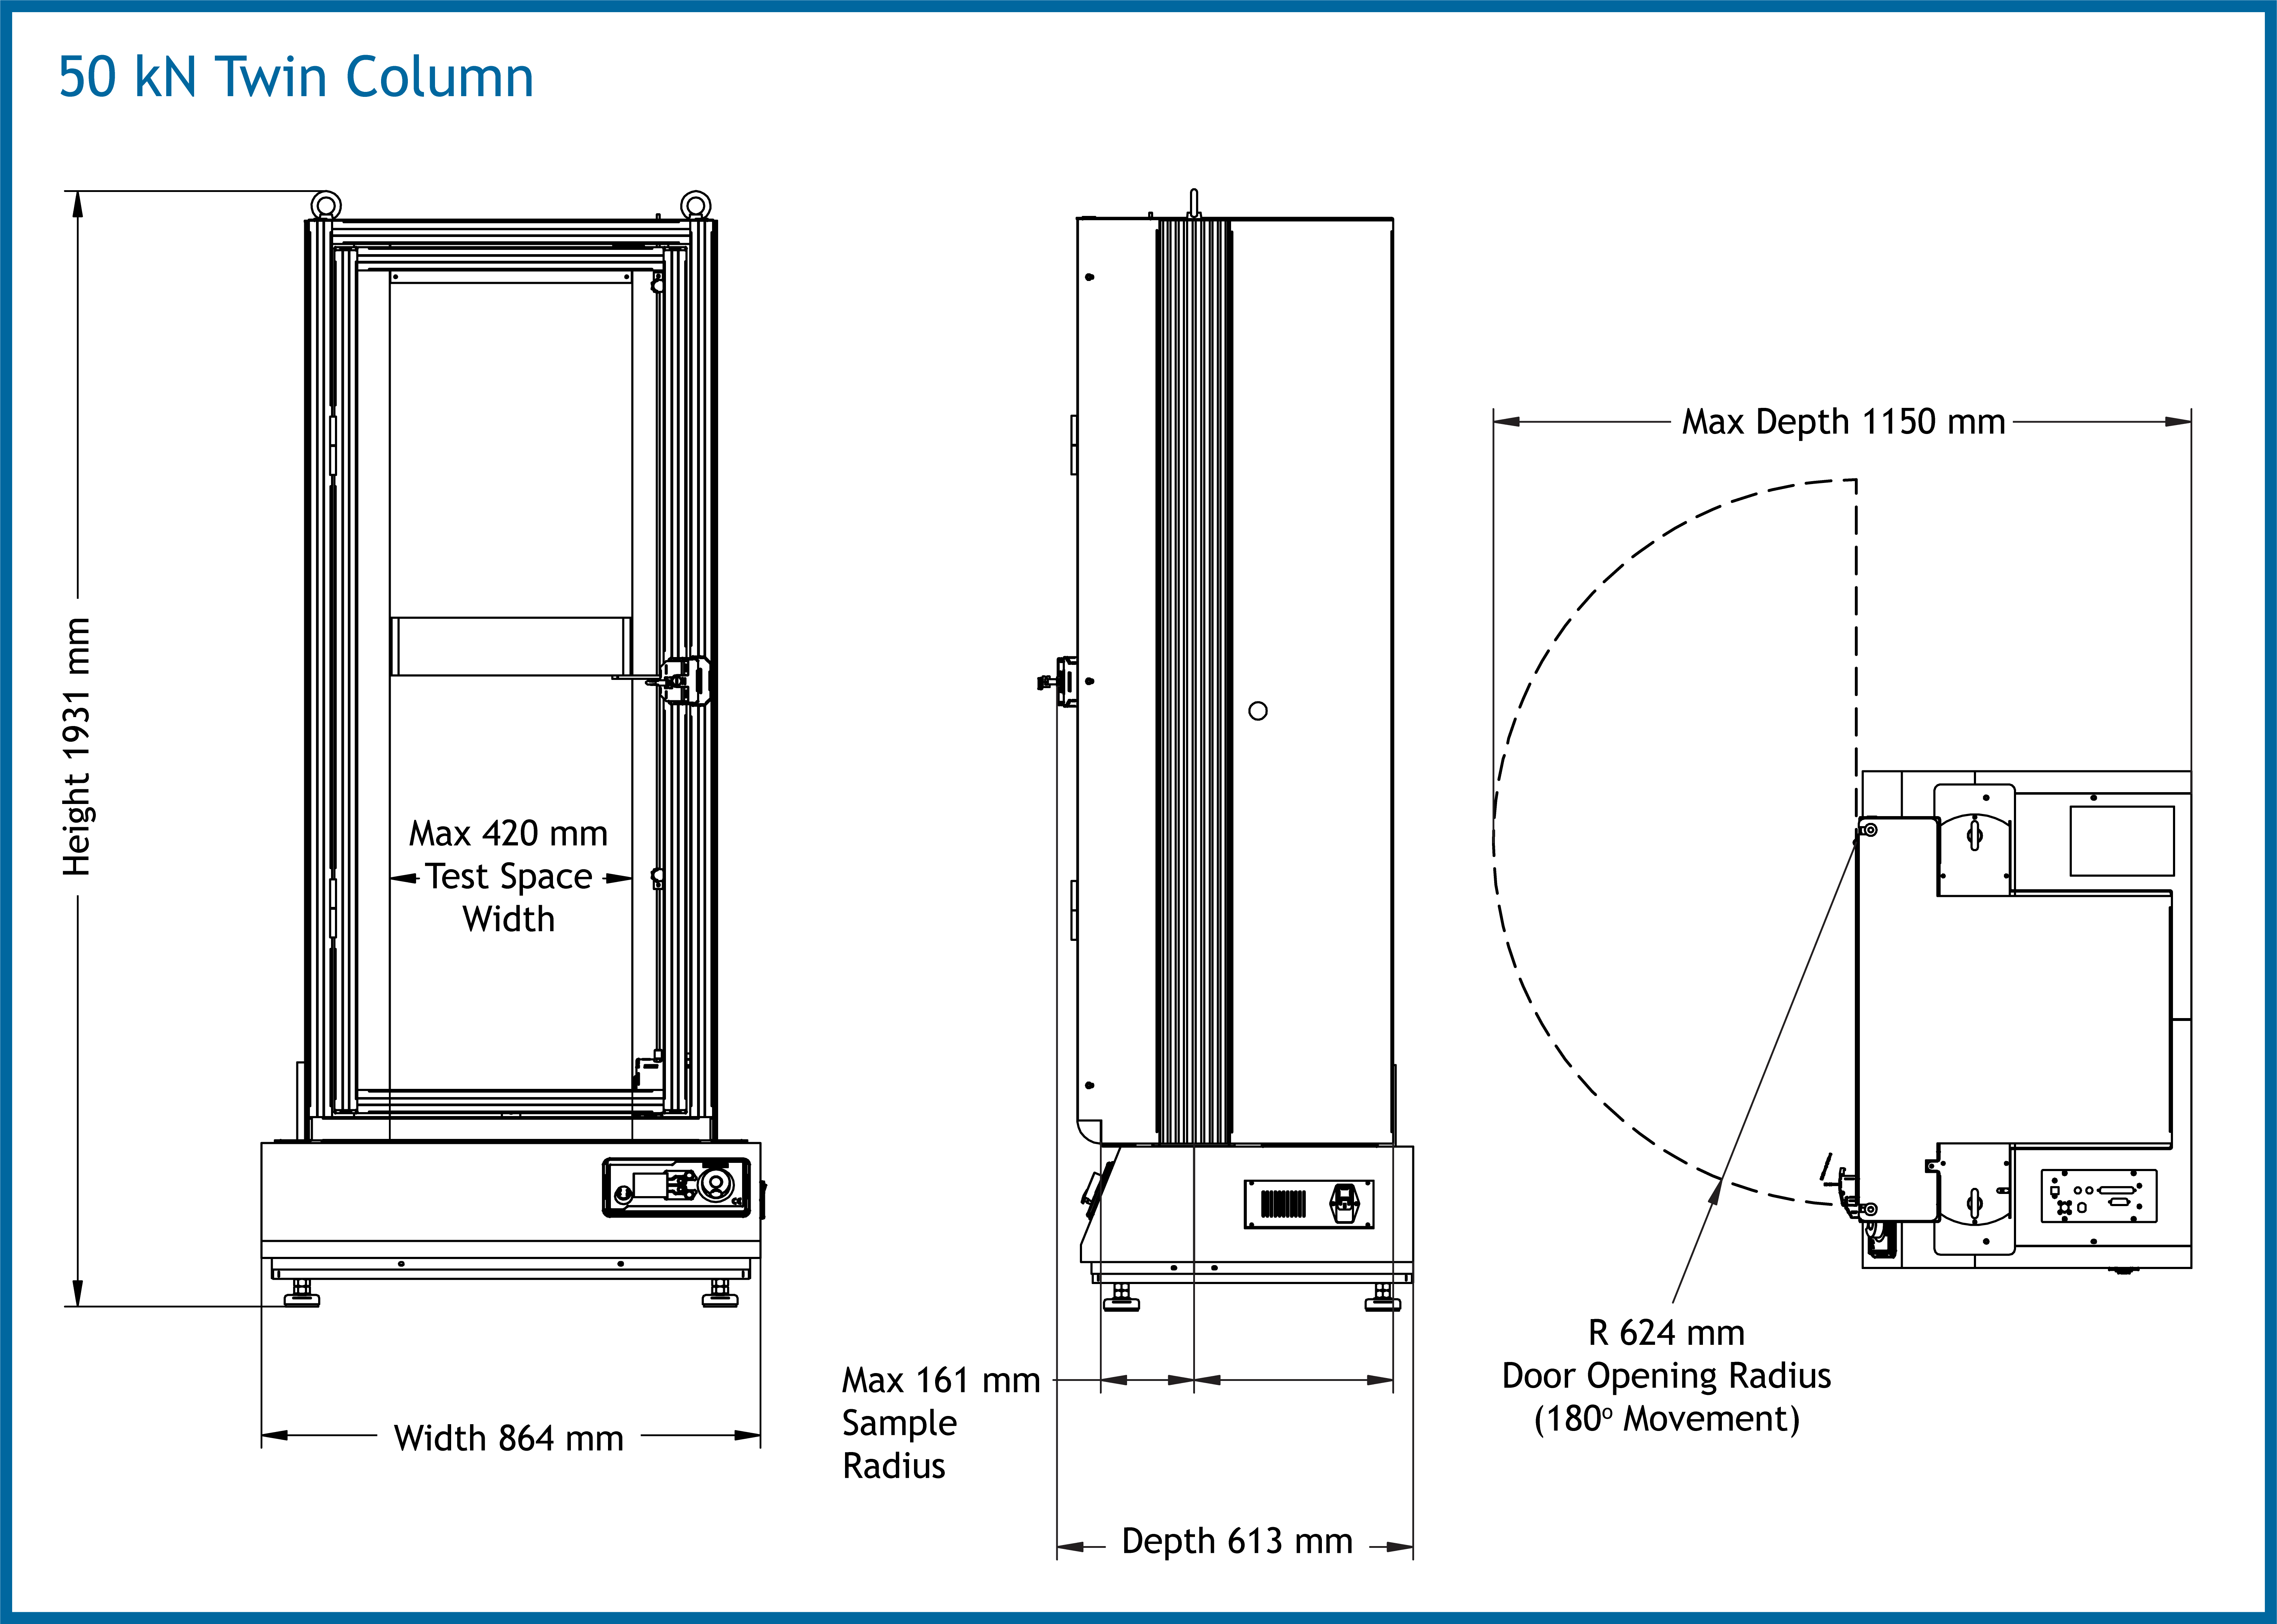 Twin Column 50 Dimensions